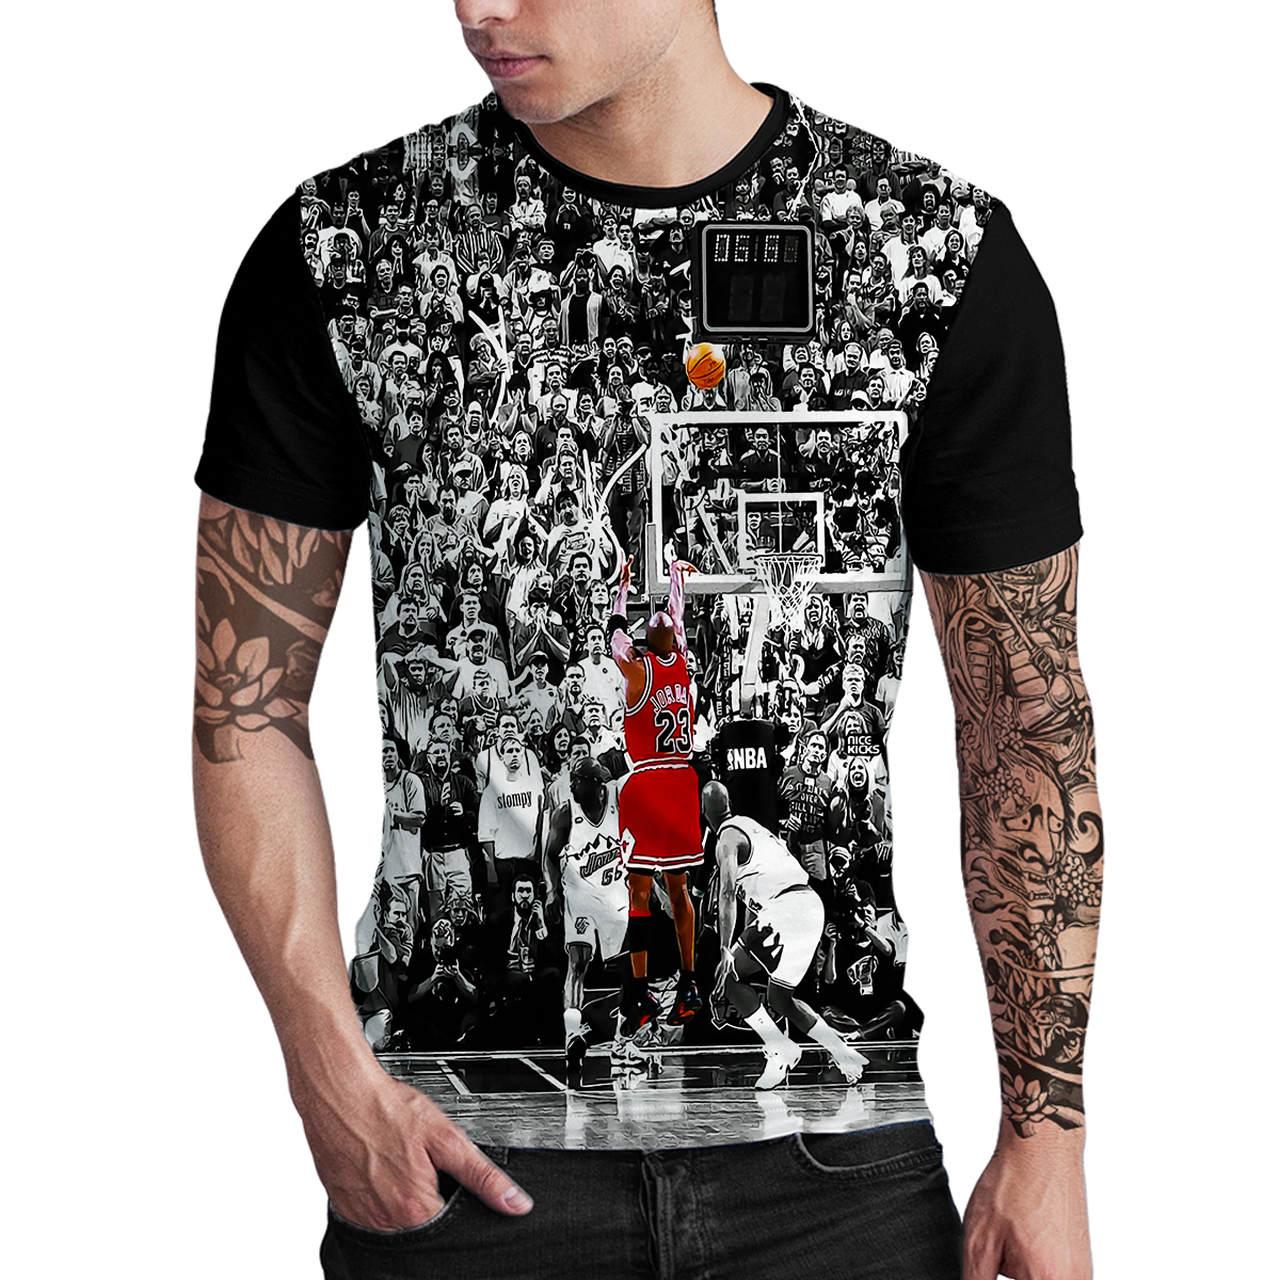 Stompy Camiseta Estampada Masculina Modelo 46